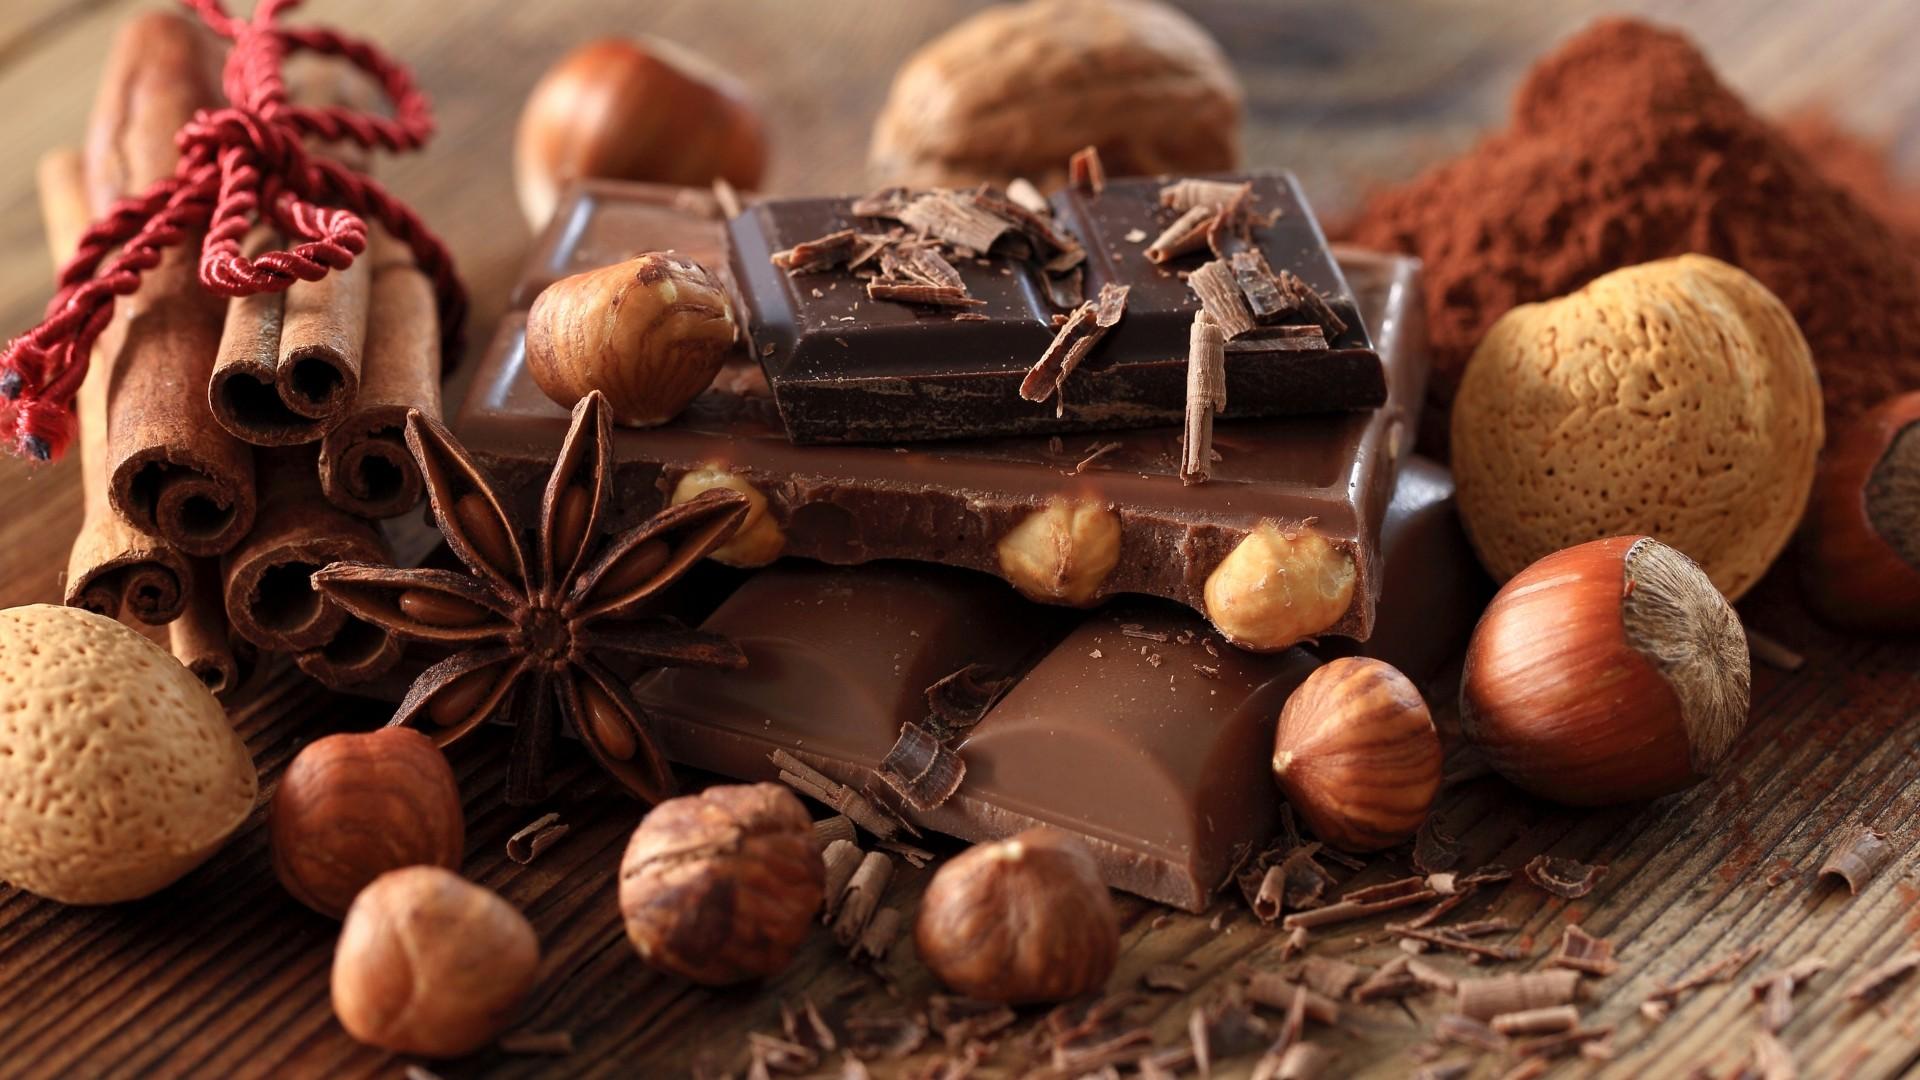 Chocolate   Chocolate Wallpaper 35500724 1920x1080